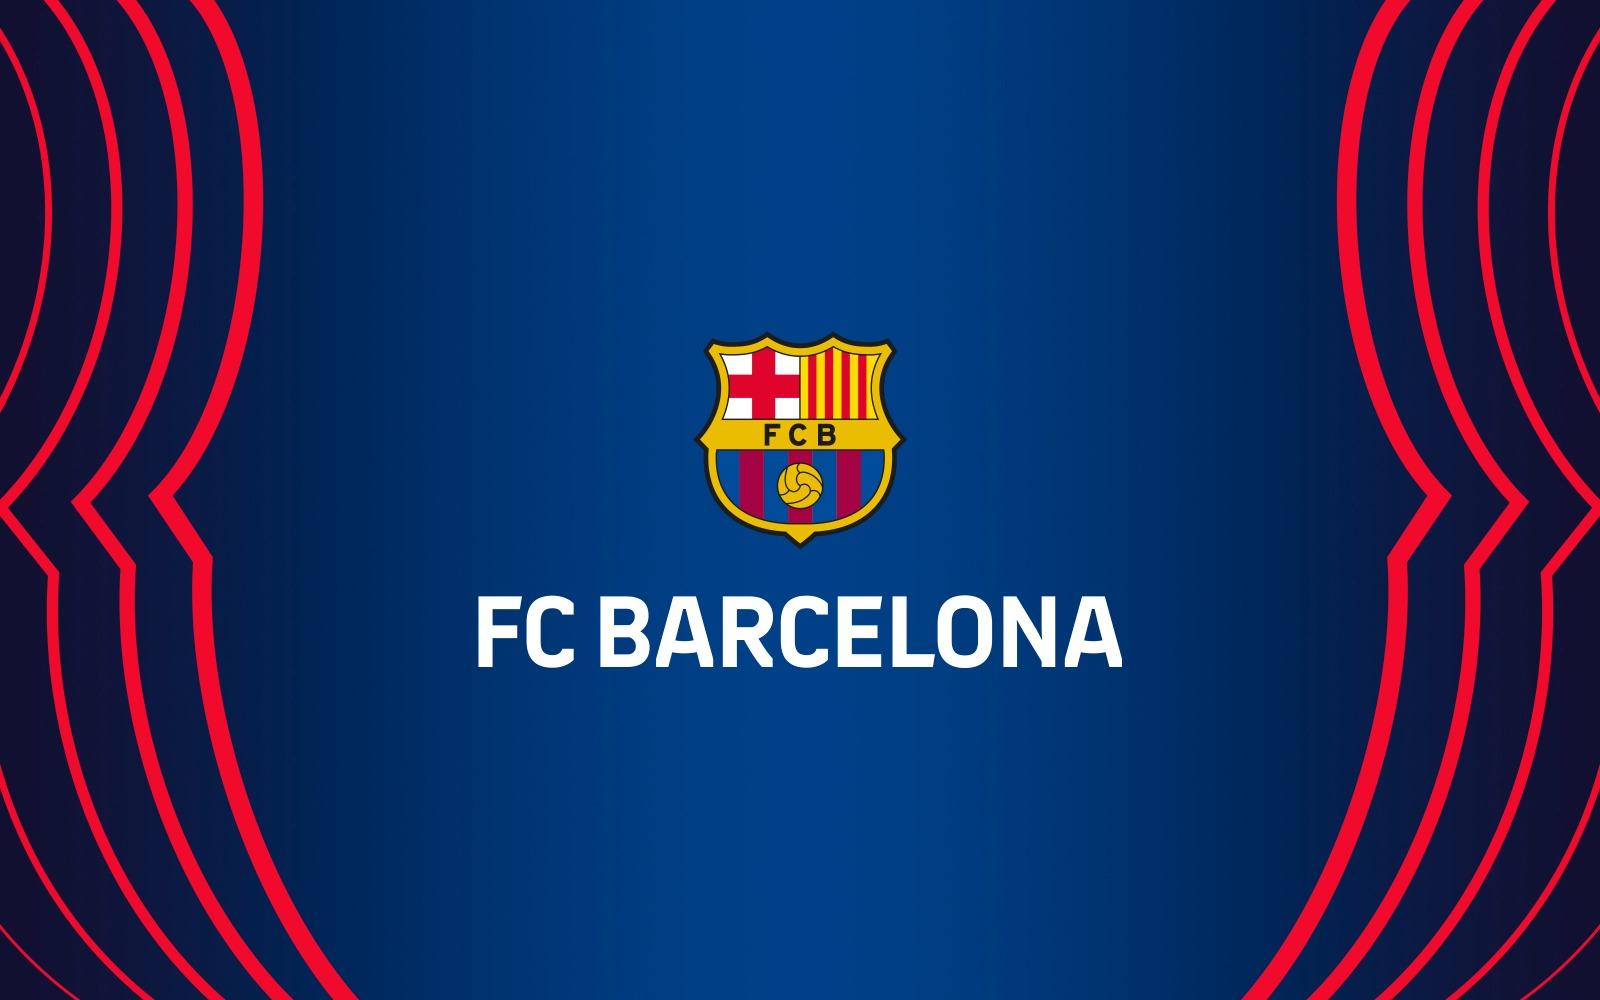 Barcelona release statement railing against La Liga's deal with CVC